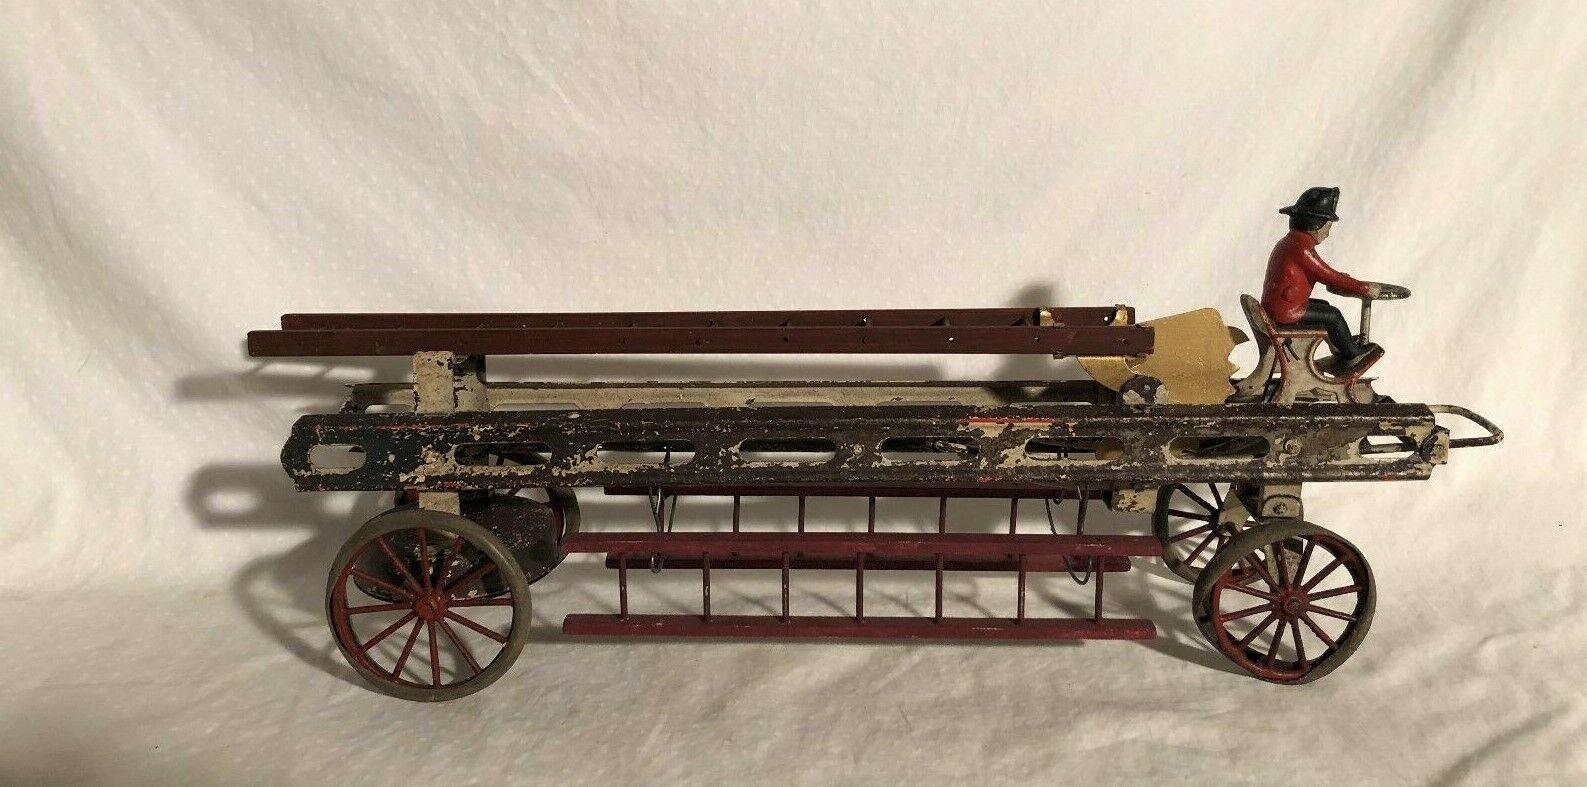 Wilkins Kingsbury Jouets Antique Fire Échelle Wagon Large Wind Up Jouet Camion